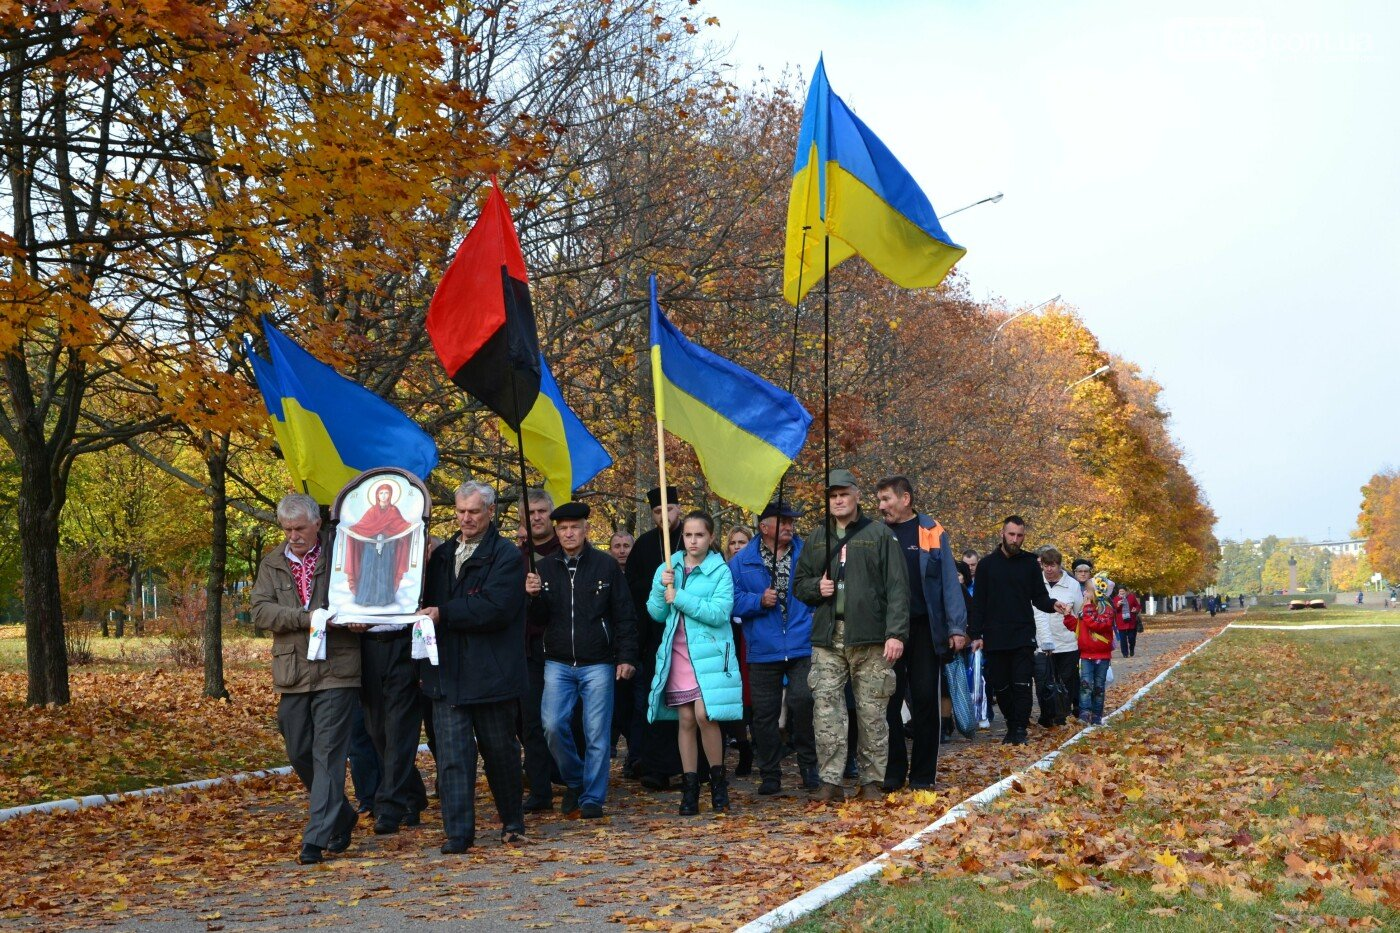 Без масок и карантина: как Лозовщина праздновала День защитника Украины год назад (ФОТО), фото-25